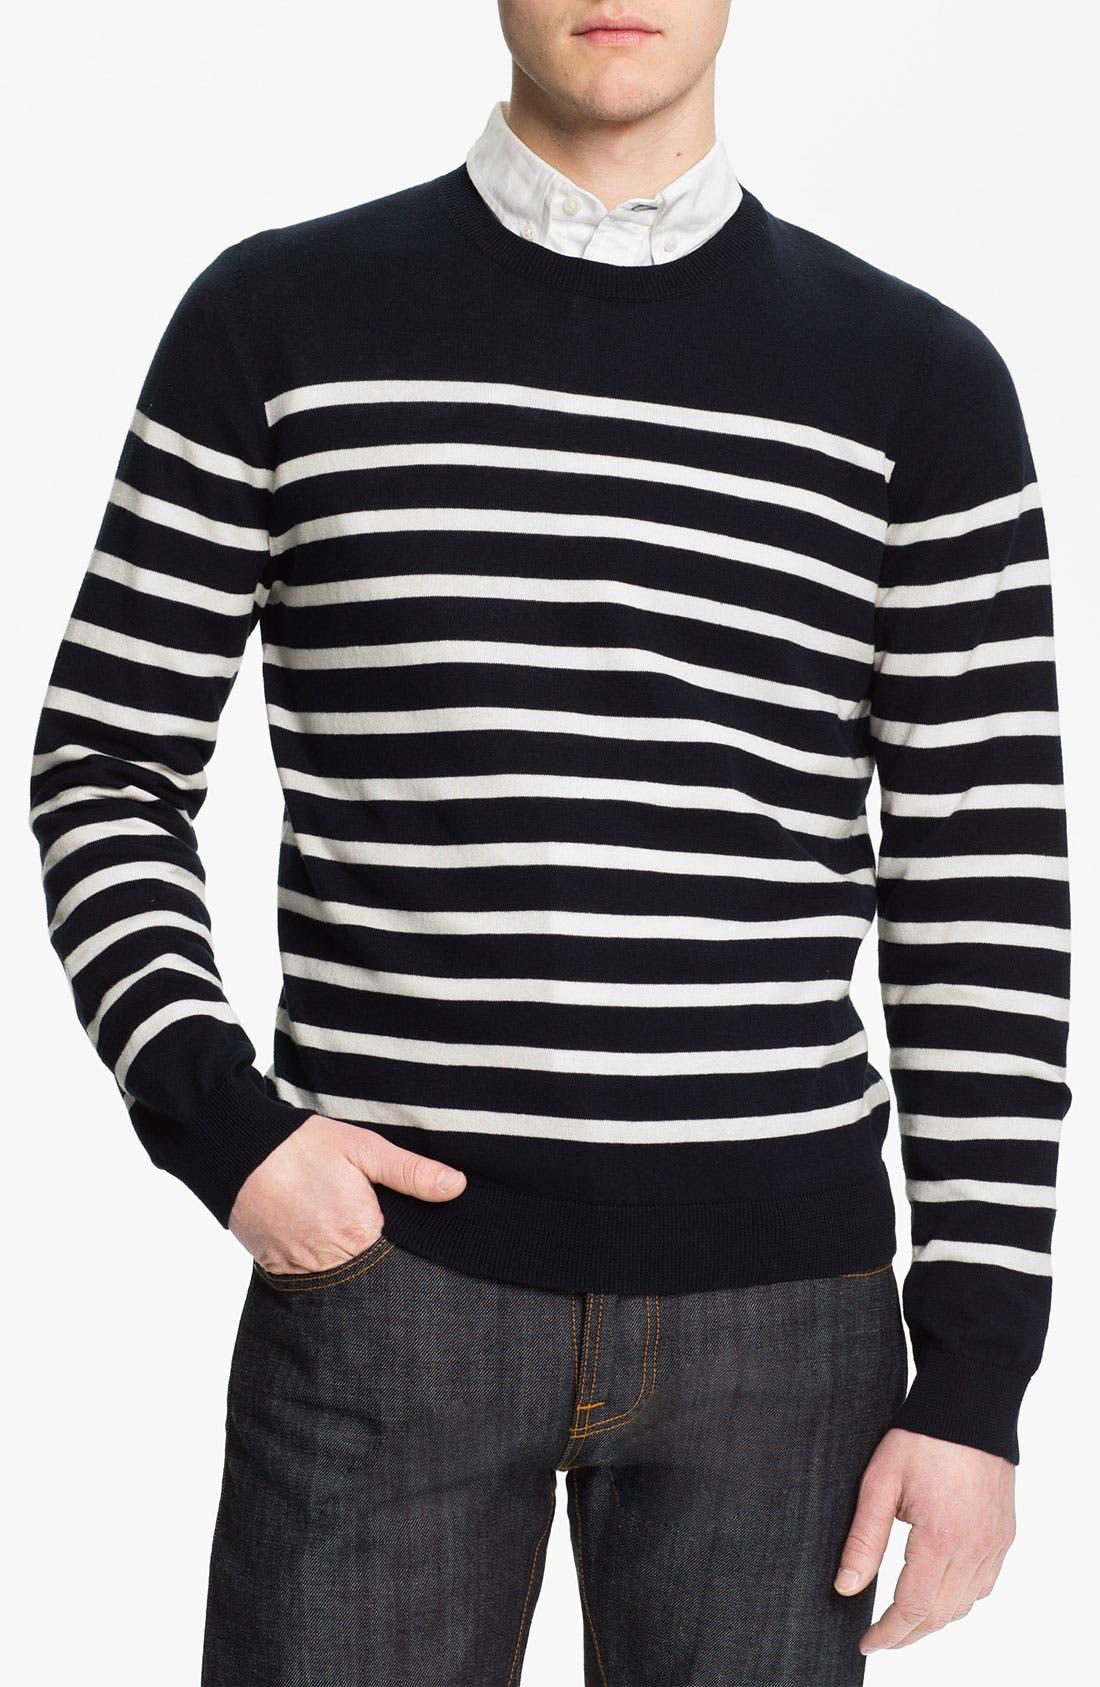 Main Image - Wallin & Bros. 'Drayton Stripe' Crewneck Sweater